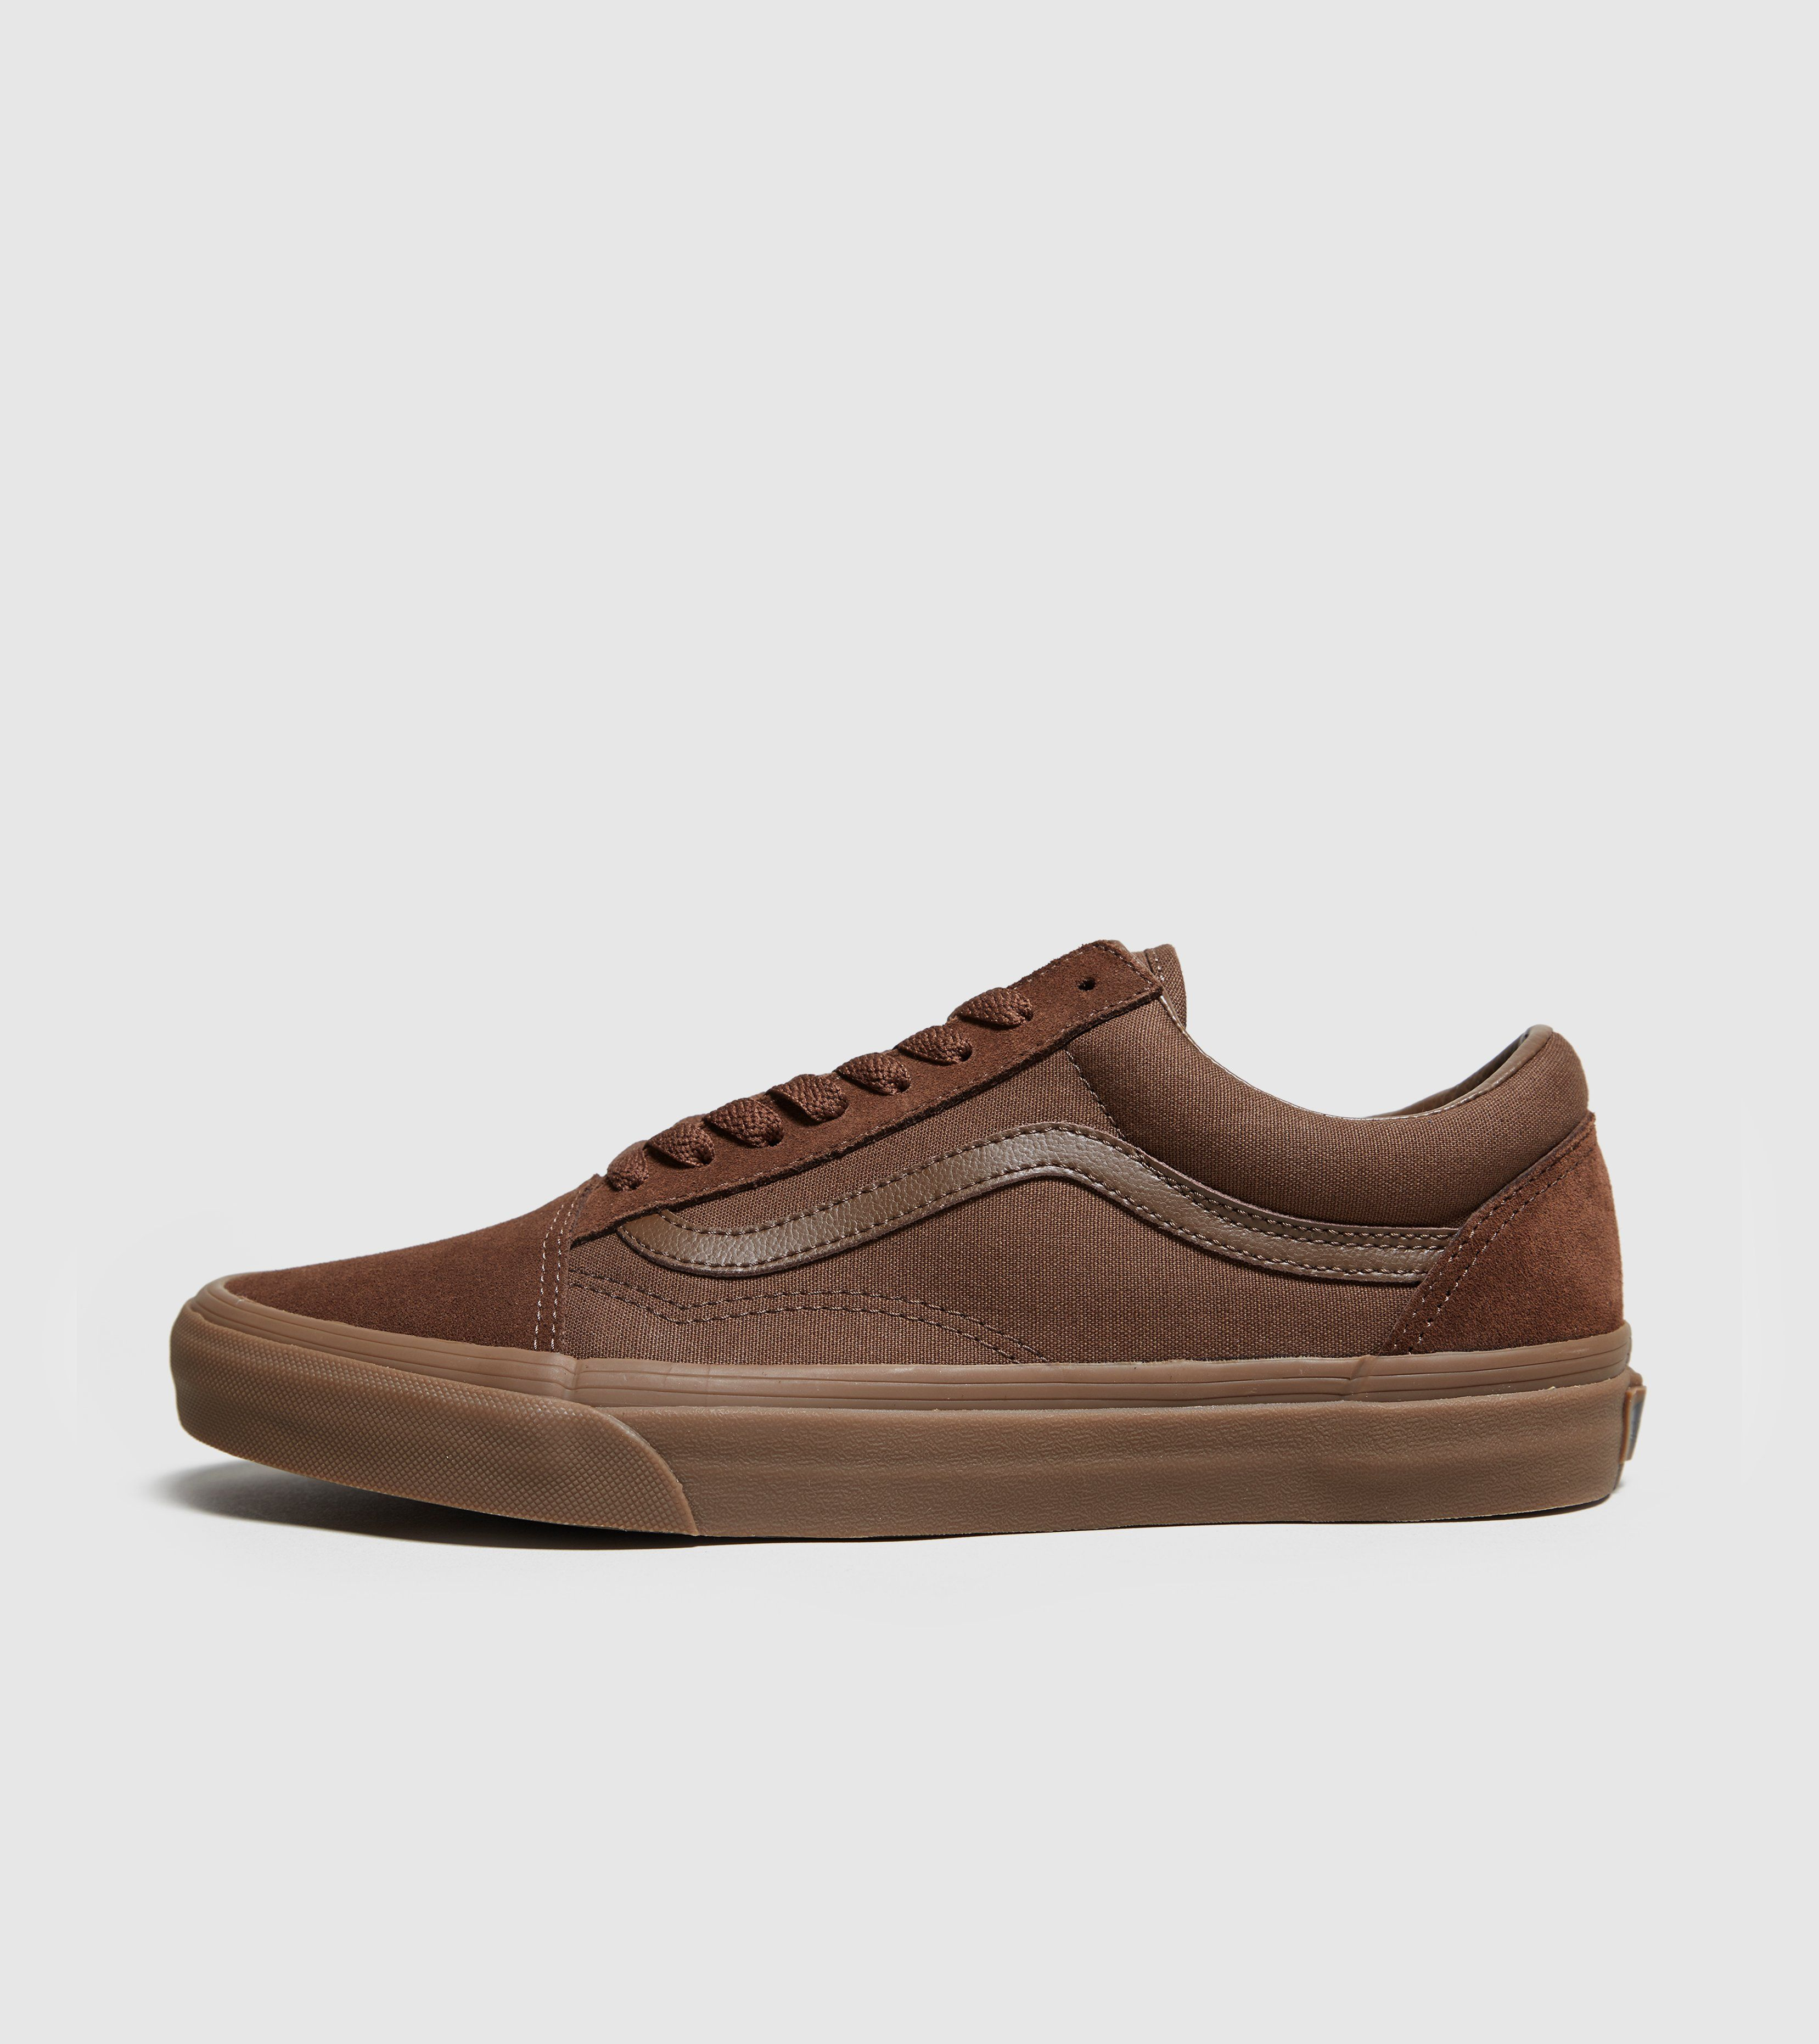 vans brown